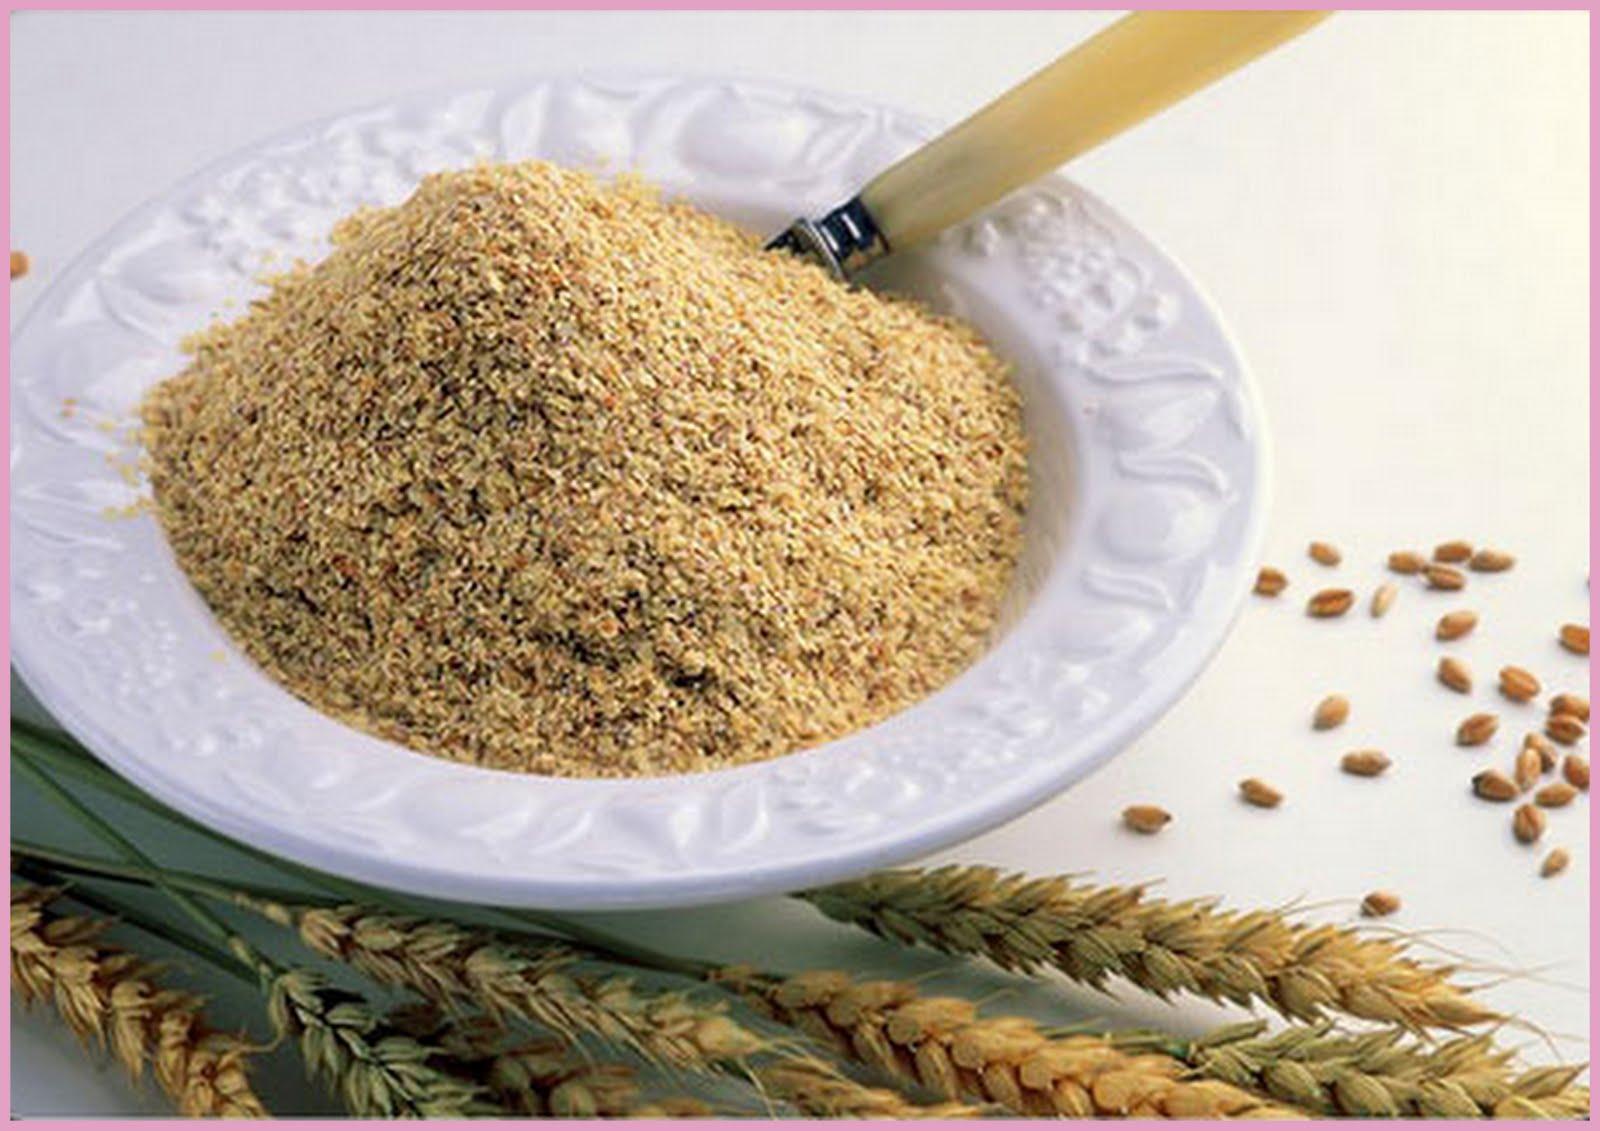 Wheat geem